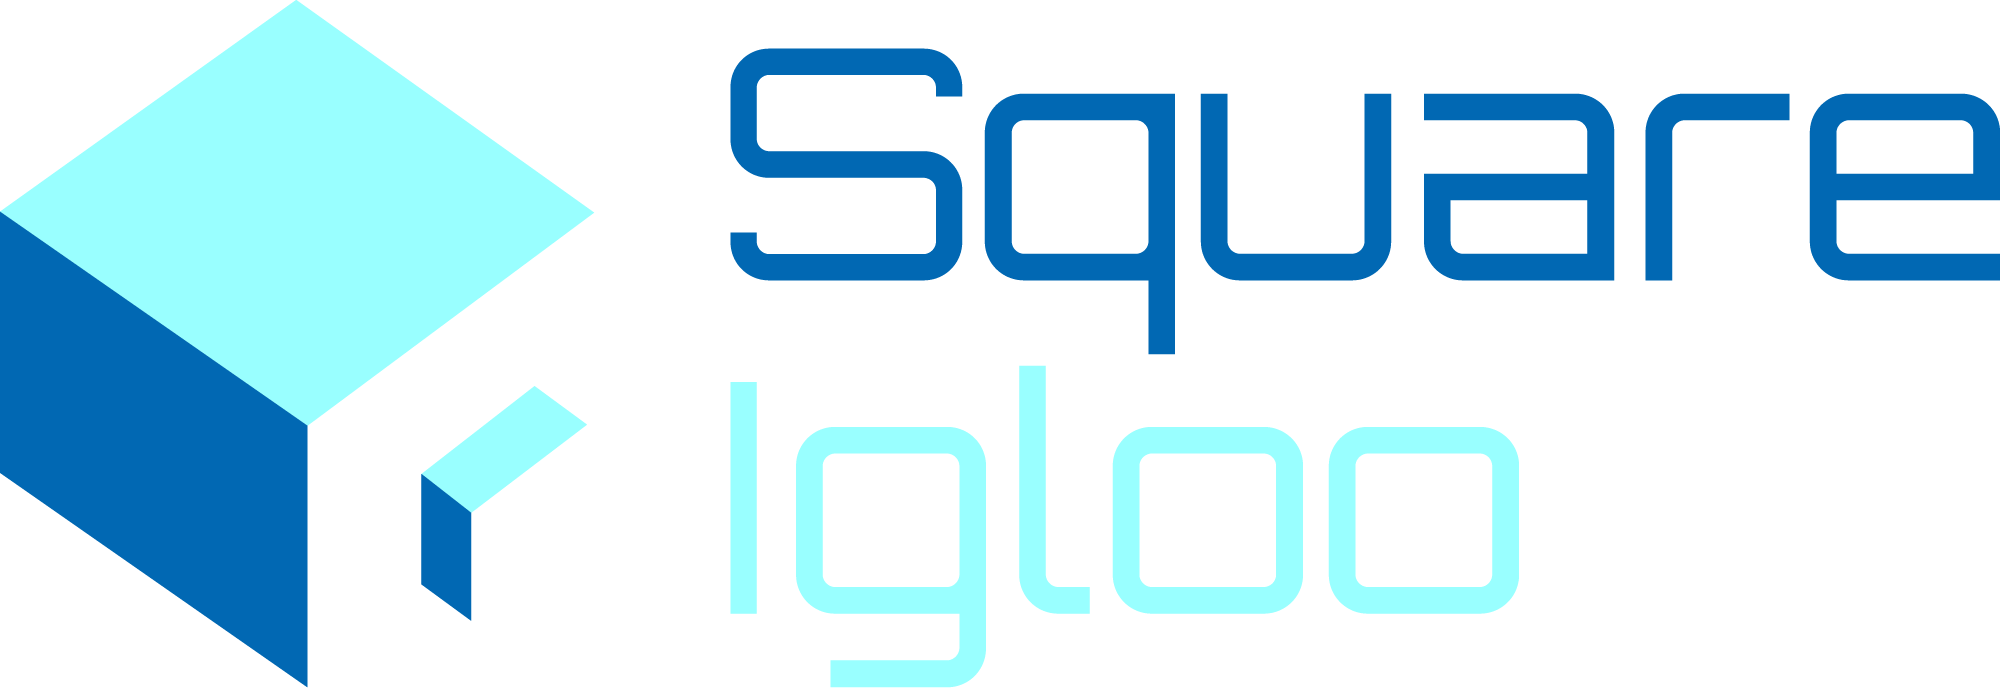 Square Igloo